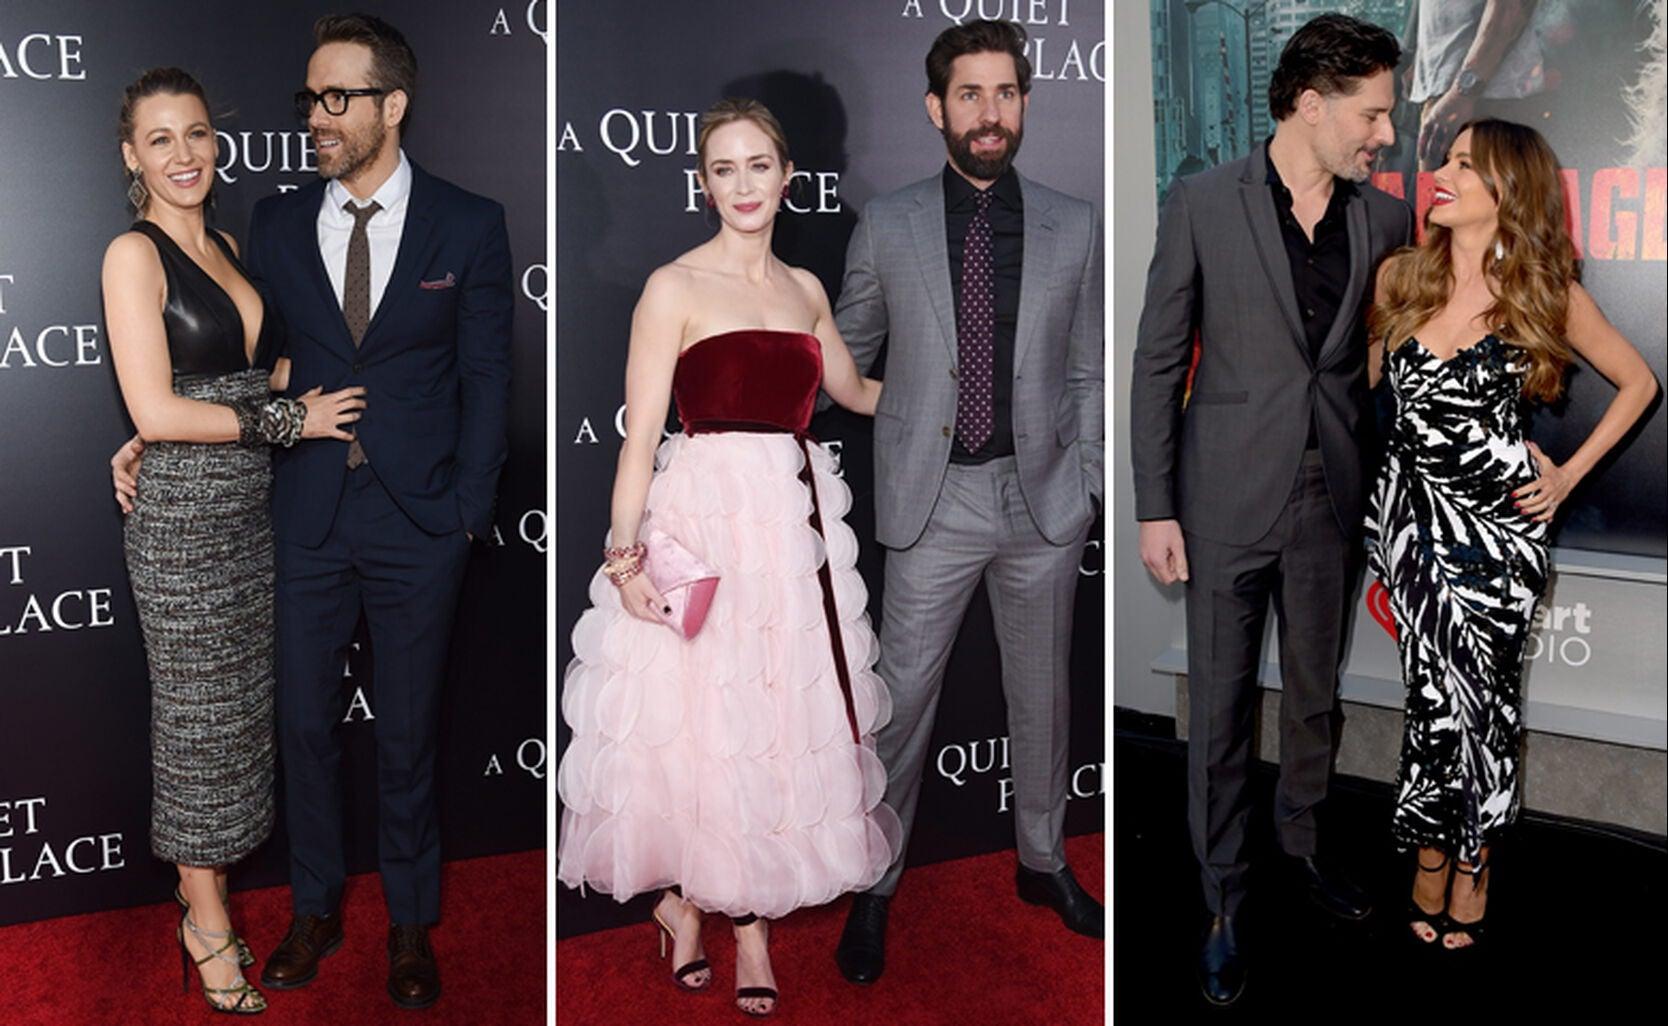 Blake Lively with Ryan Reynolds, Emily Blunt with John Krasinski, and Joe Manganiello with Sofia Vergara